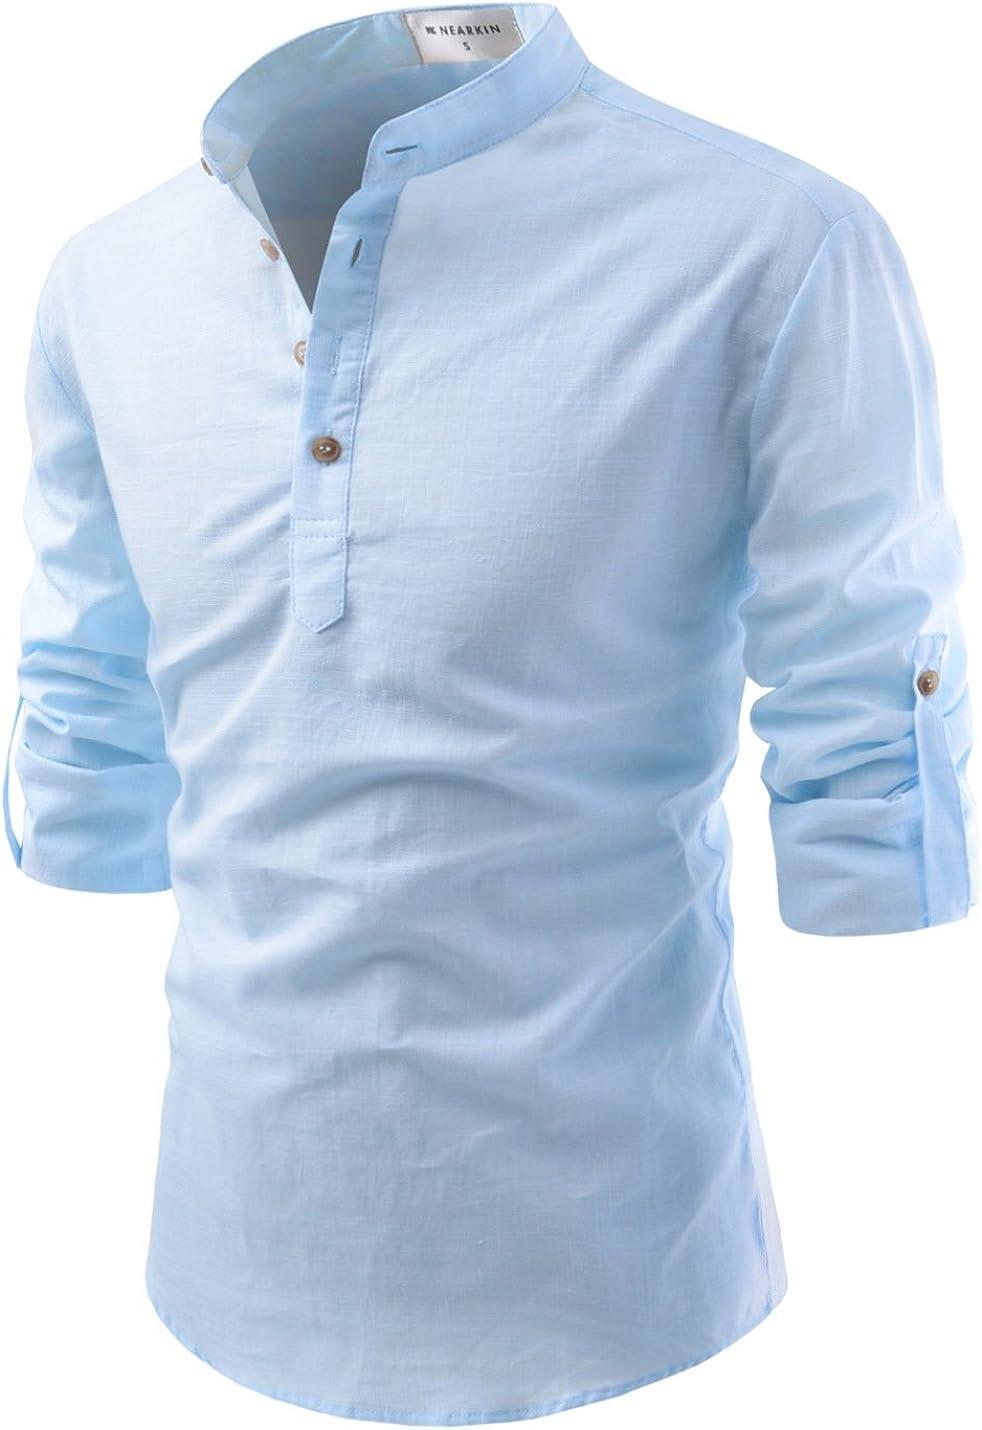 TheLees transformar enrollable funda mandarina Henley Cuello Ropa Camisas